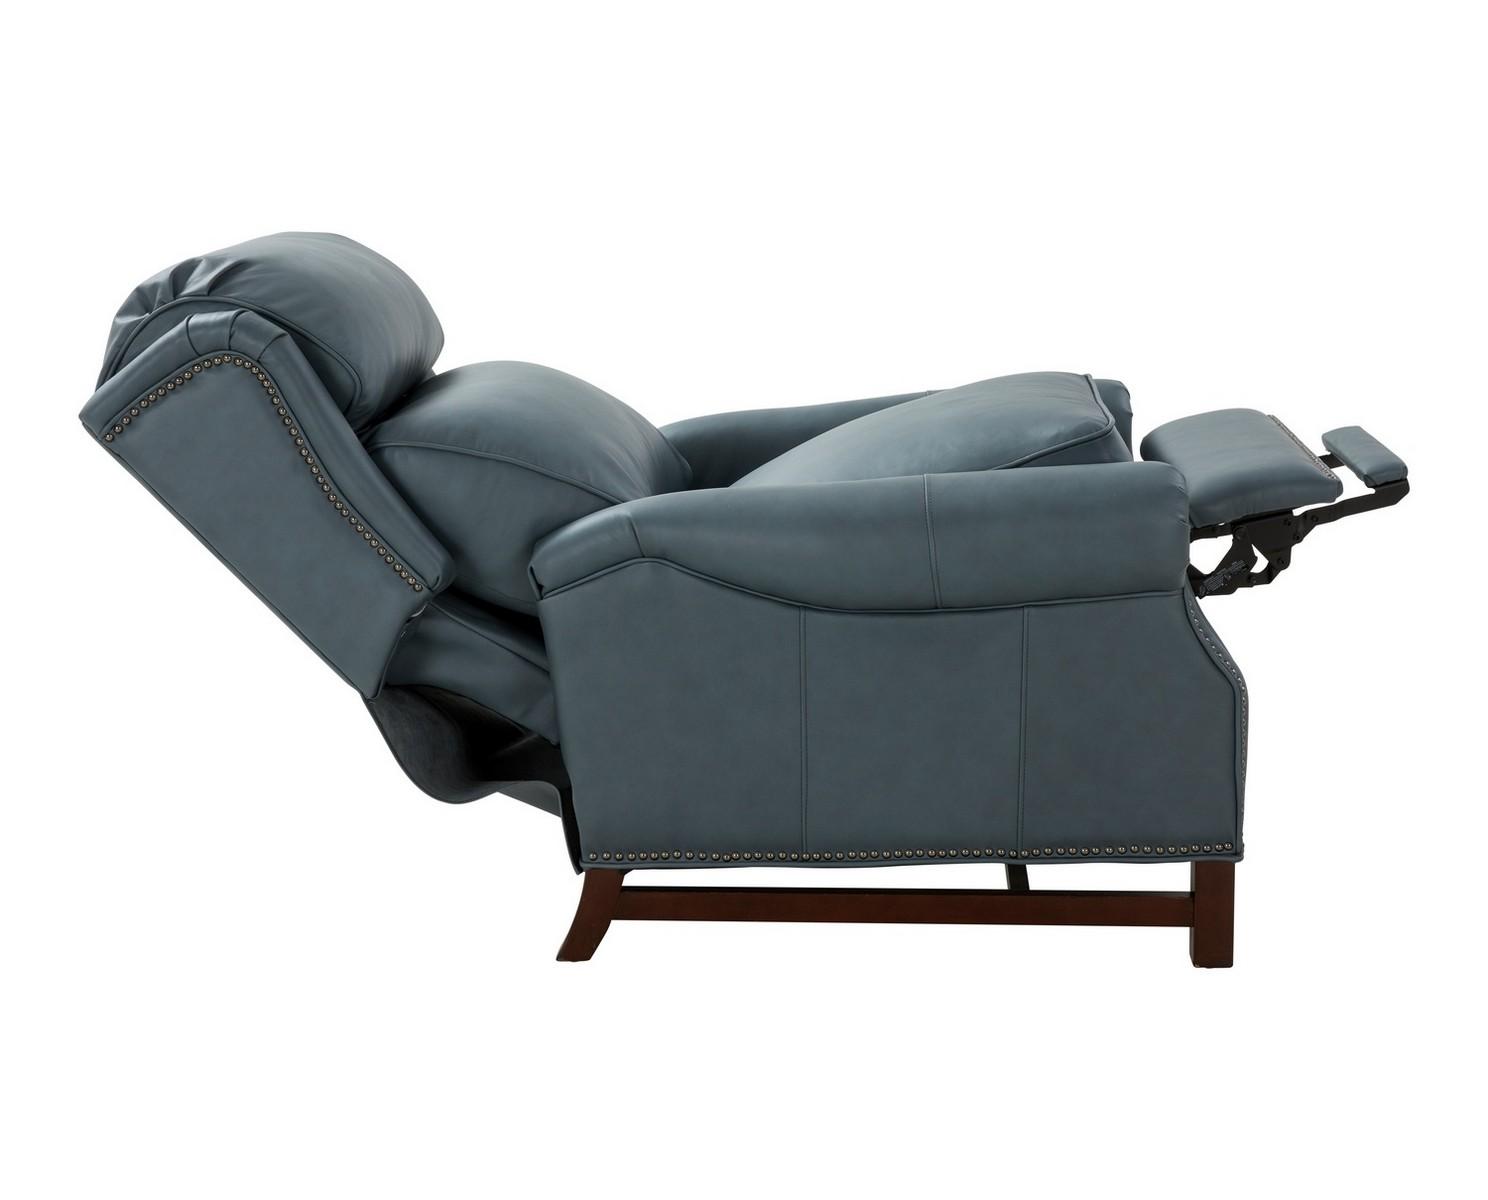 Barcalounger Thornfield Recliner Chair - Corbett Steel Gray/All Leather